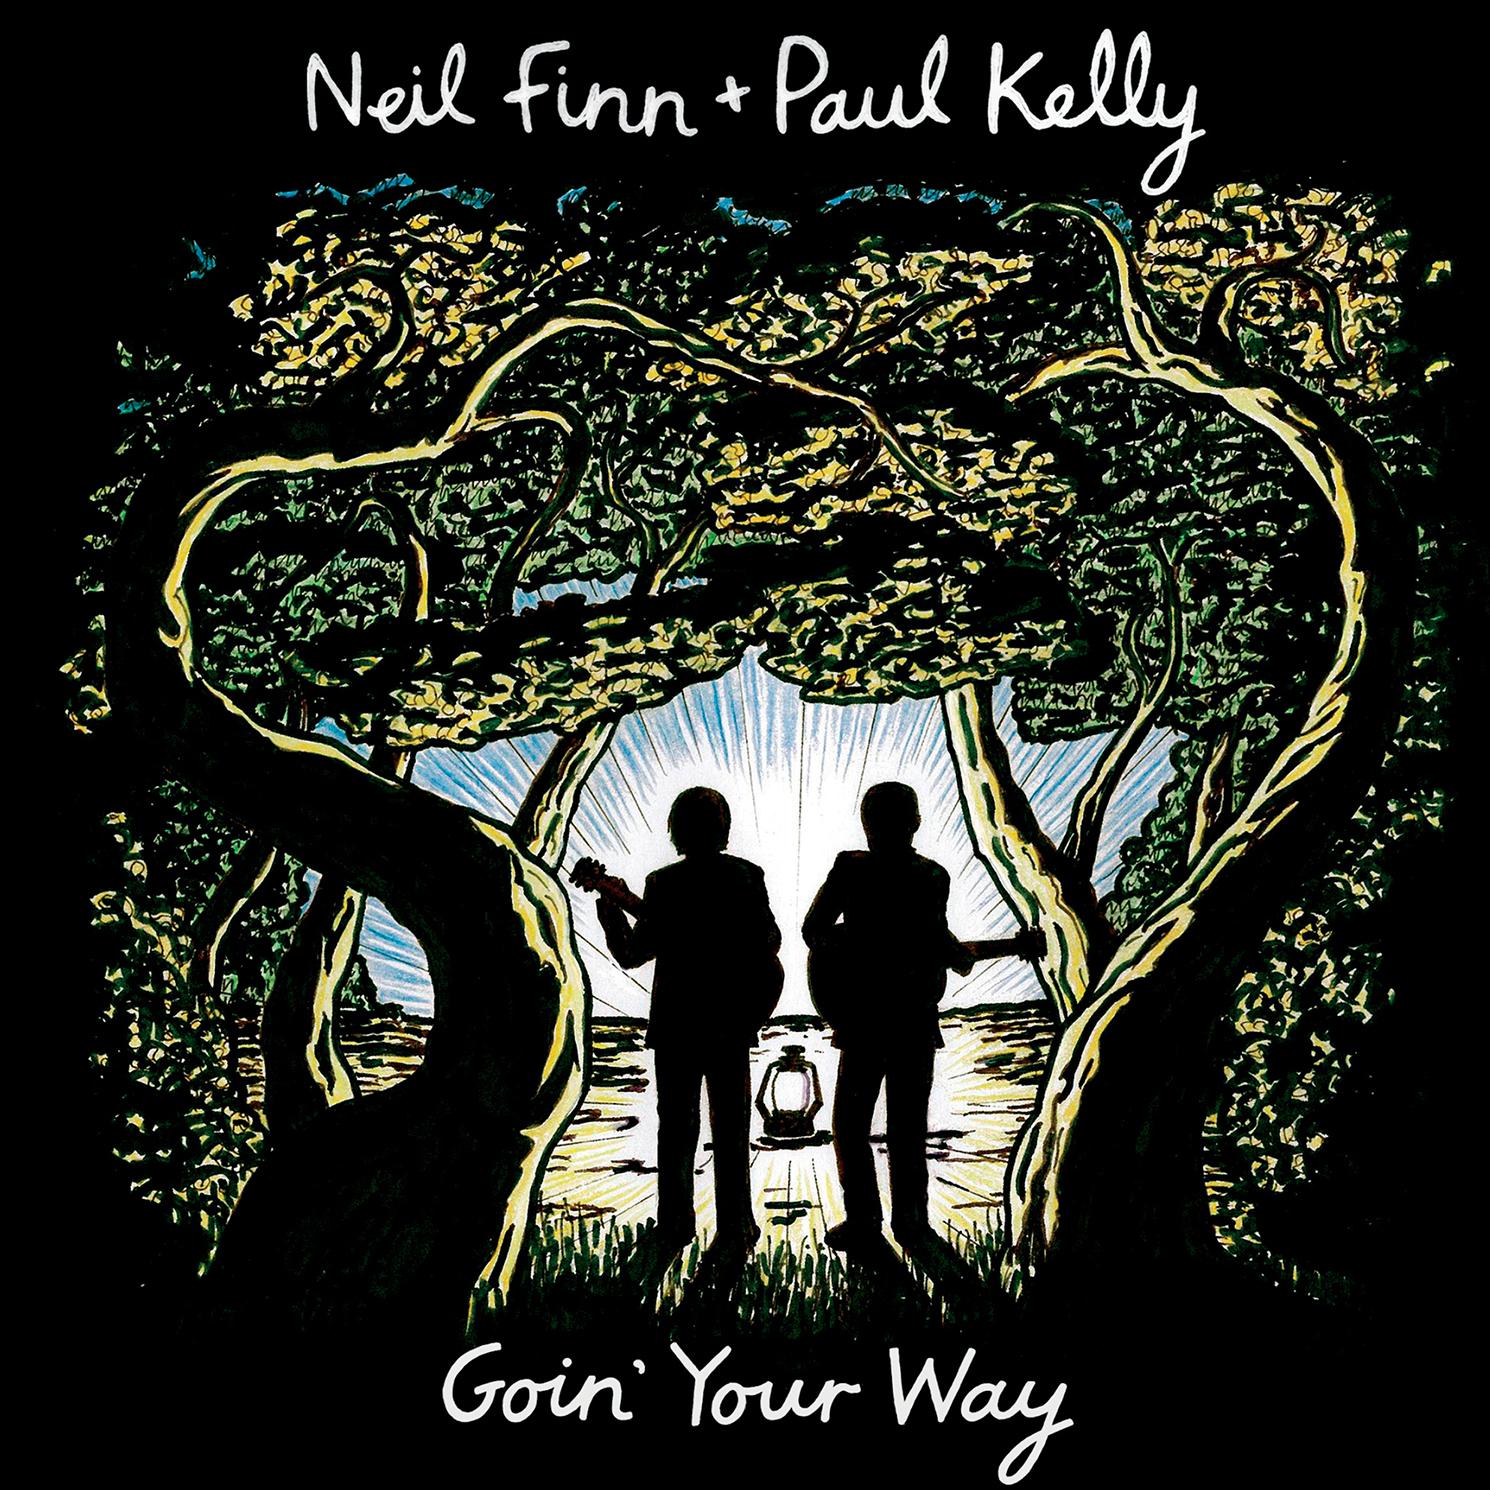 Neil Finn + Paul Kelly - Goin' Your Way  Release Date: December 11, 2015 Label: Omnivore Recordings  SERVICE: Mastering NUMBER OF DISCS: 1 GENRE: Rock FORMAT: CD   TRAILER